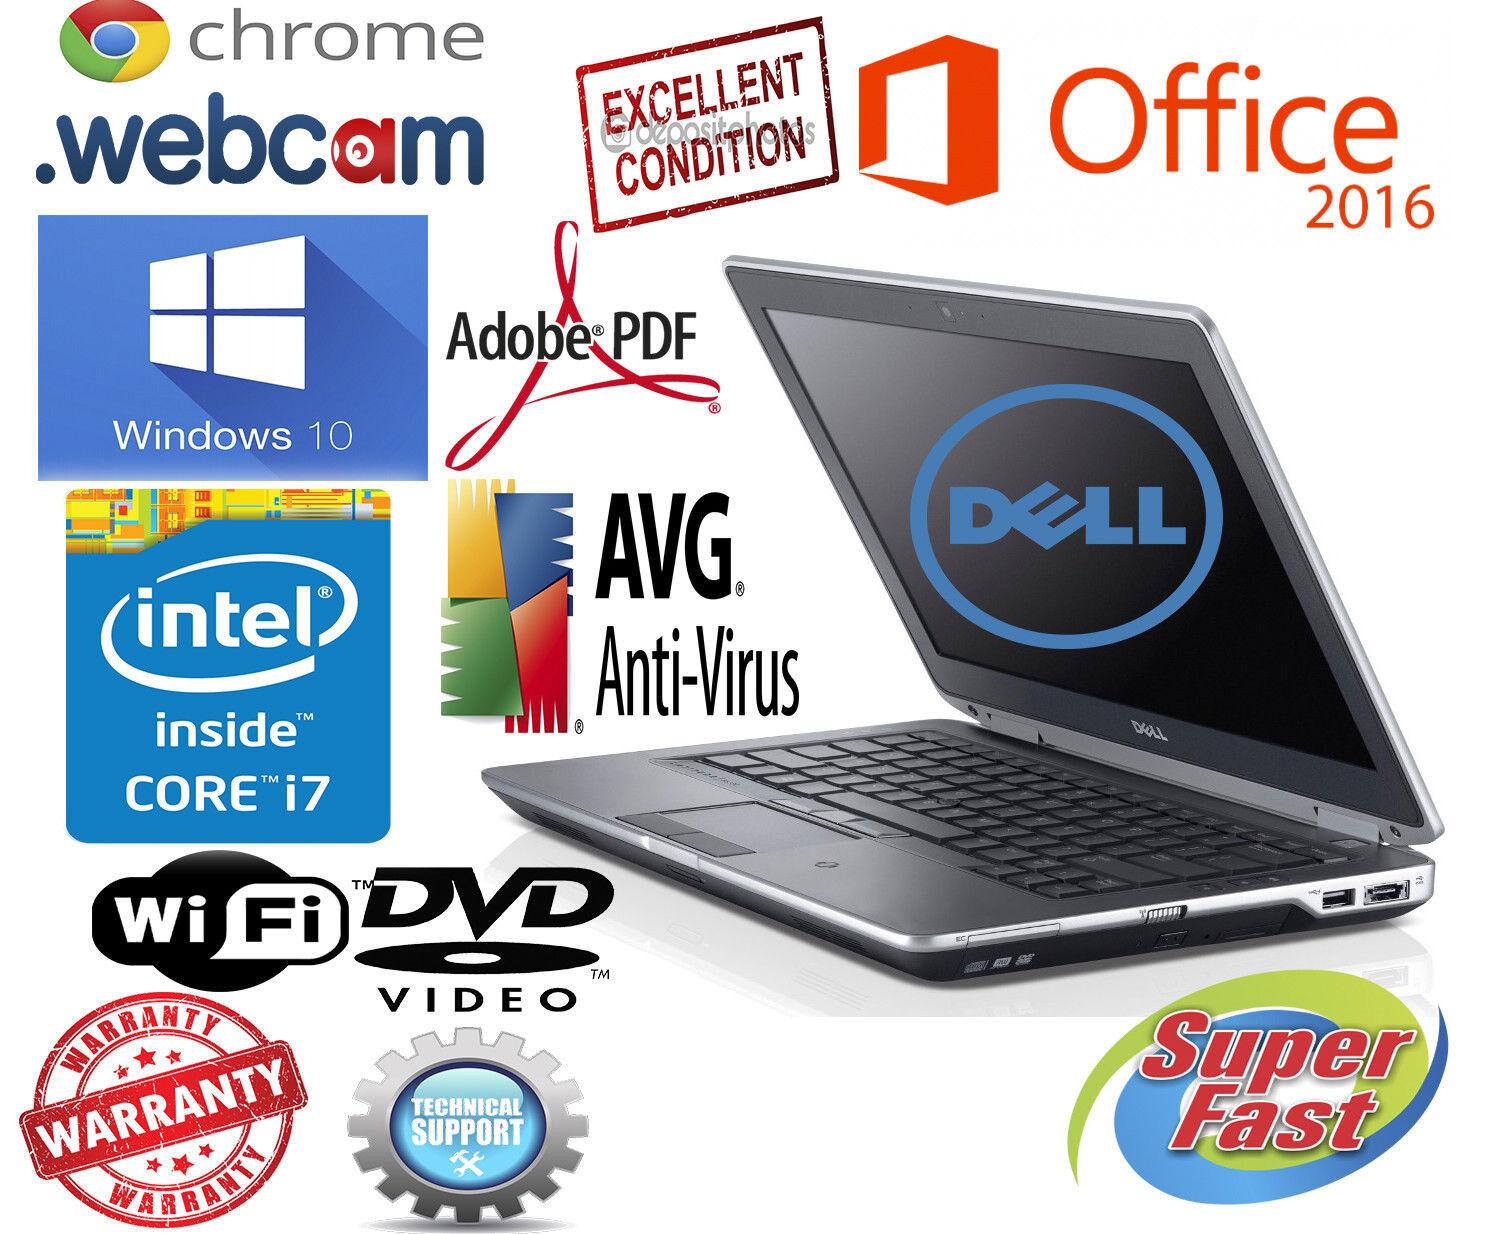 $289.88 - DELL LATITUDE Laptop Computer PC CORE I7 Windows 8GB PRO OFFICE WiFi NOTEBOOK HD